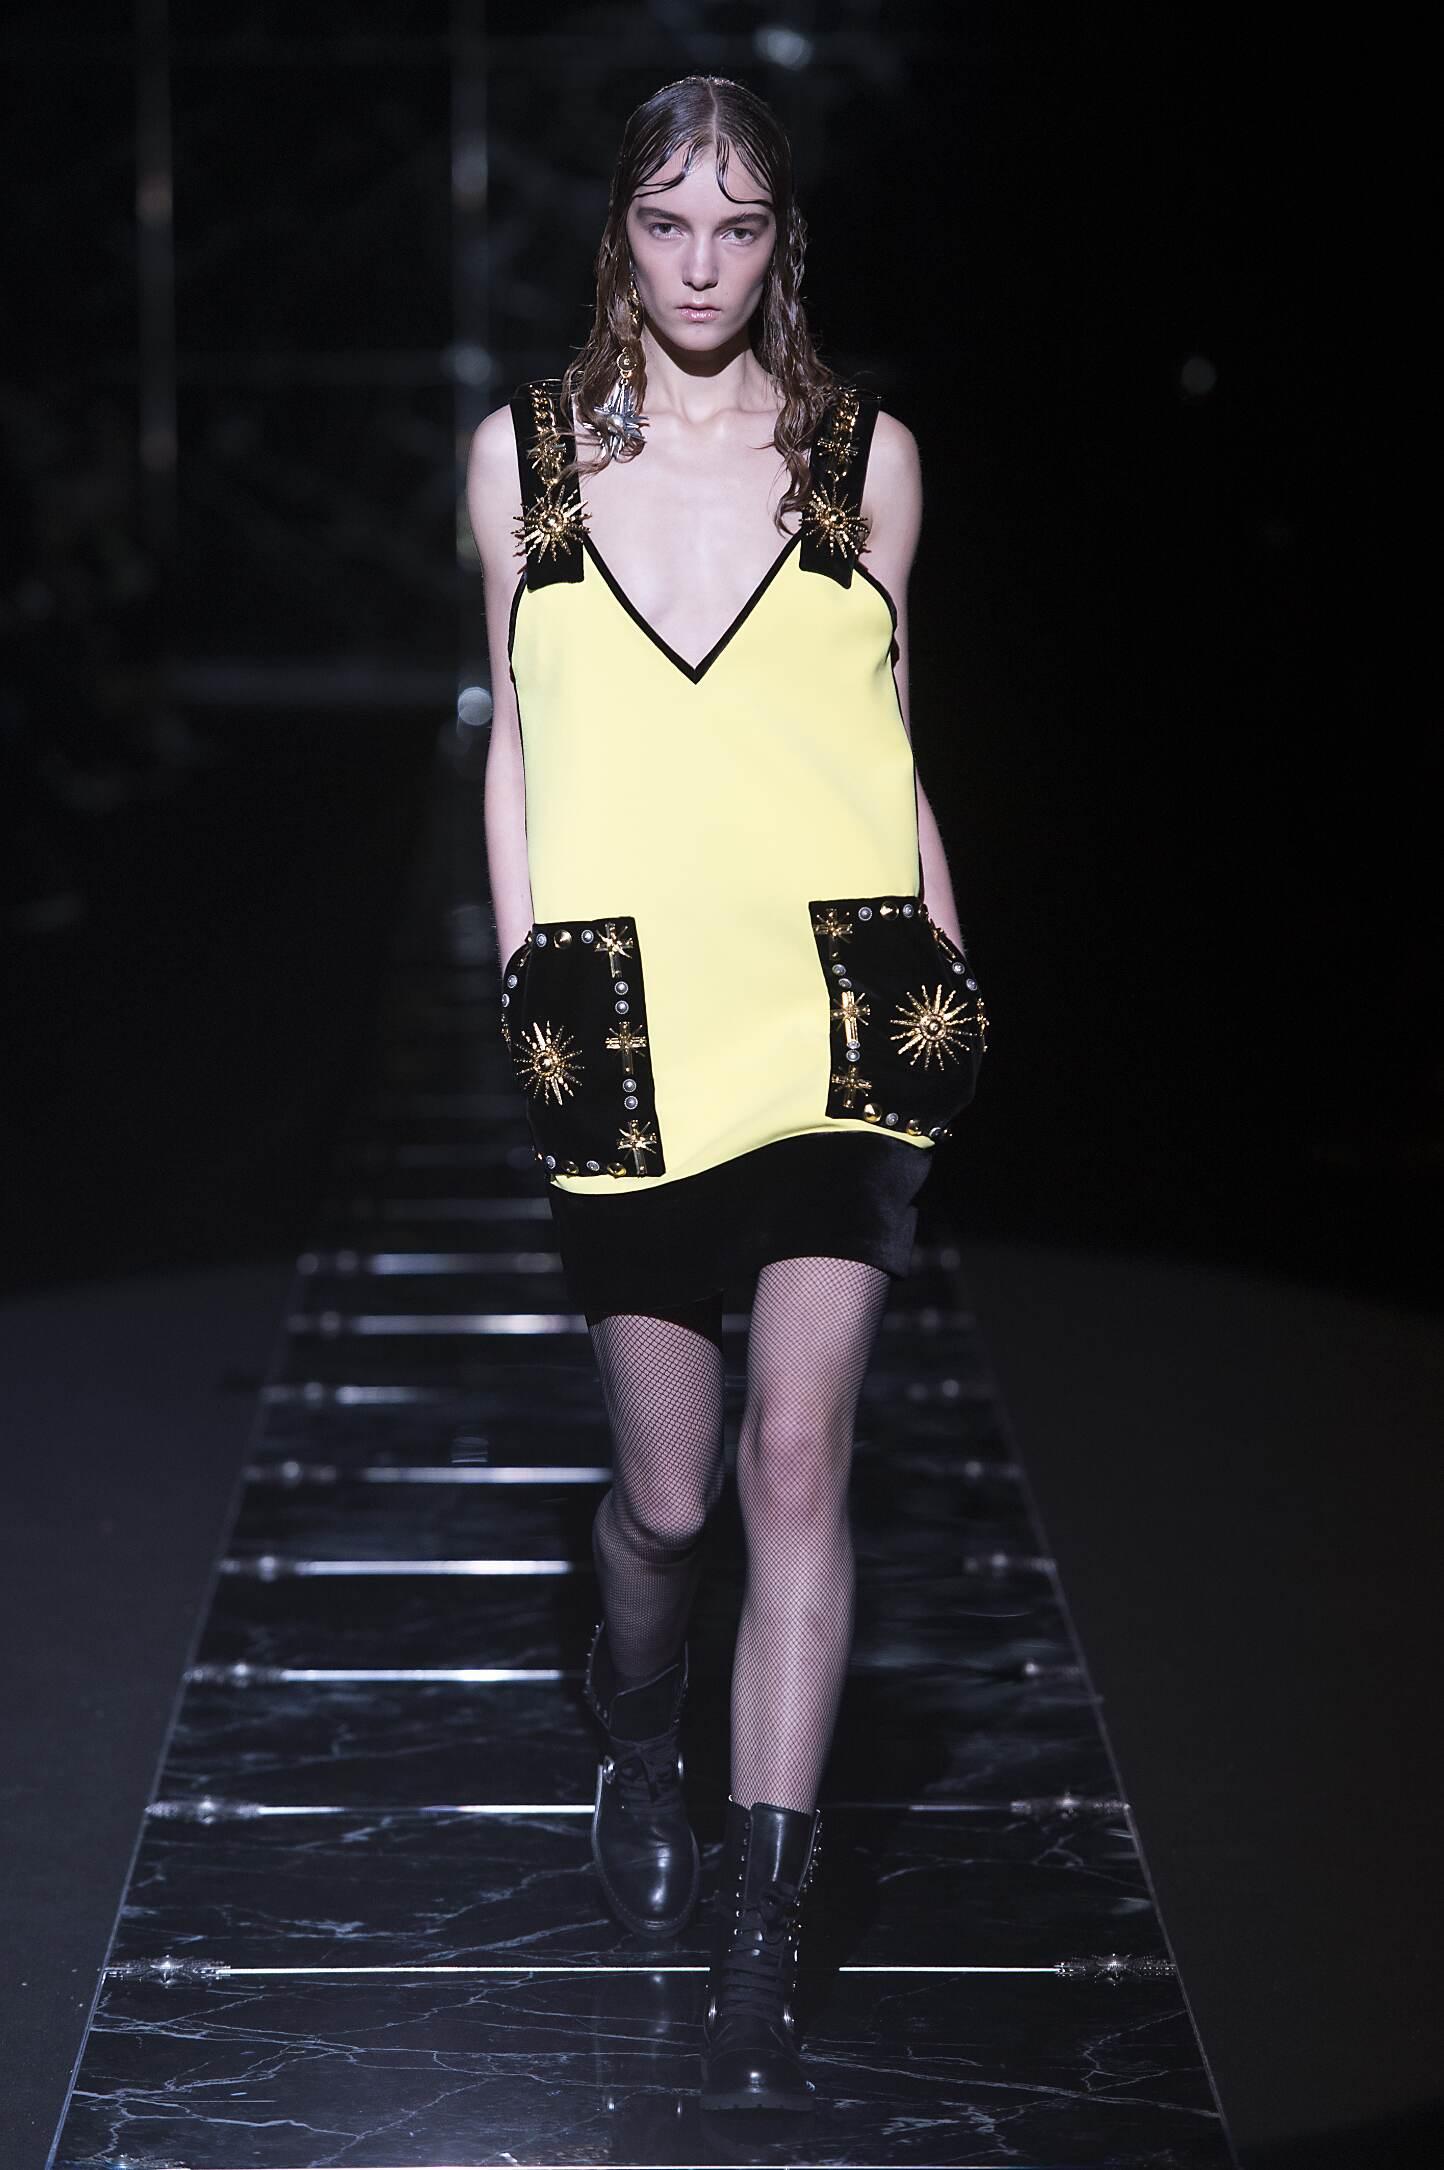 Winter 2015 Fashion Trends Fausto Puglisi Collection